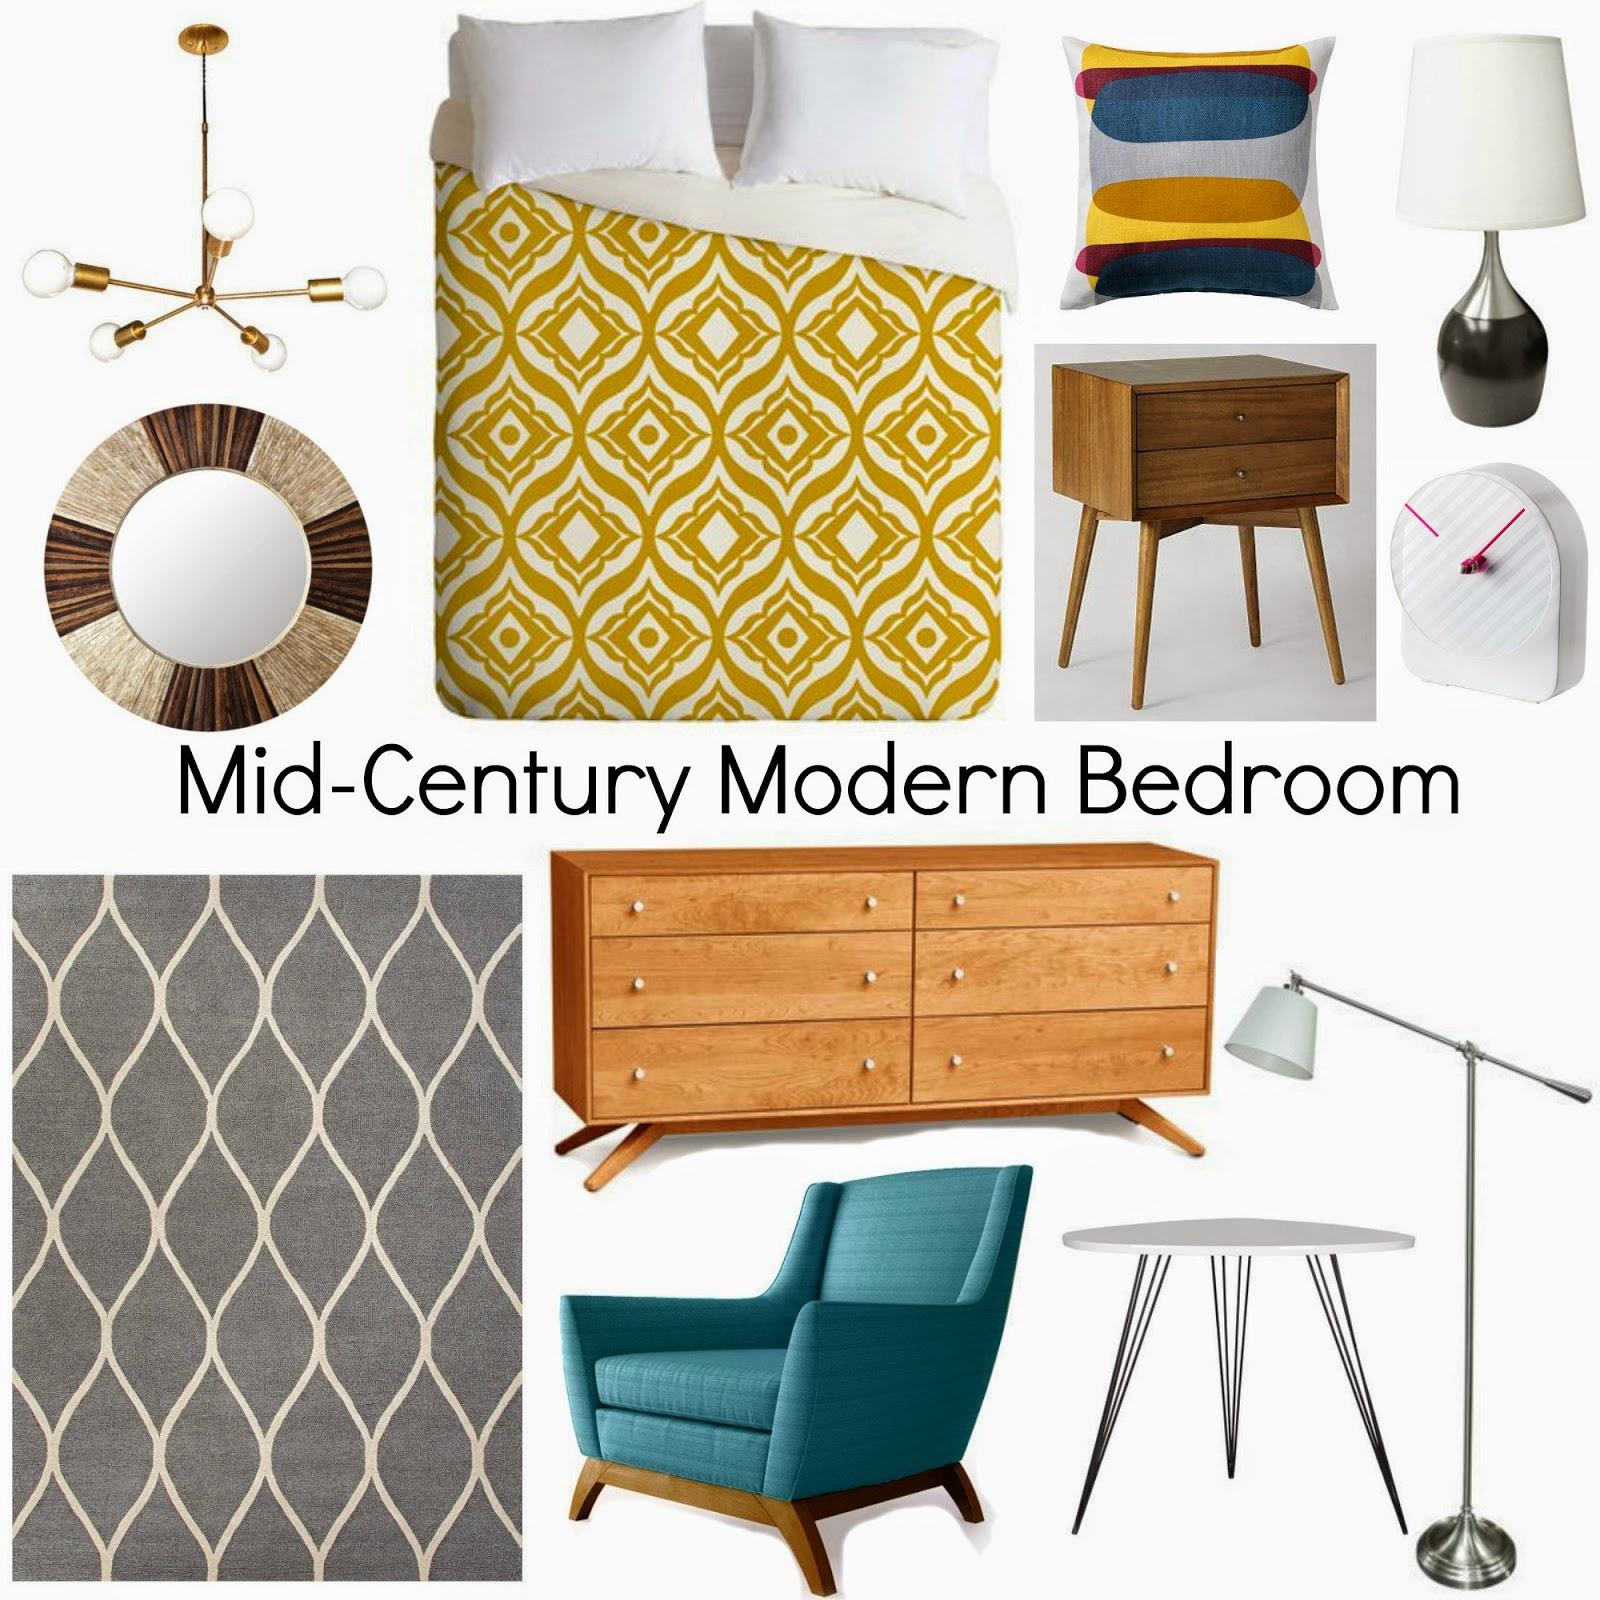 Mid Century Modern Bedroom: Decorating Cents: Mid-Century Modern Bedroom